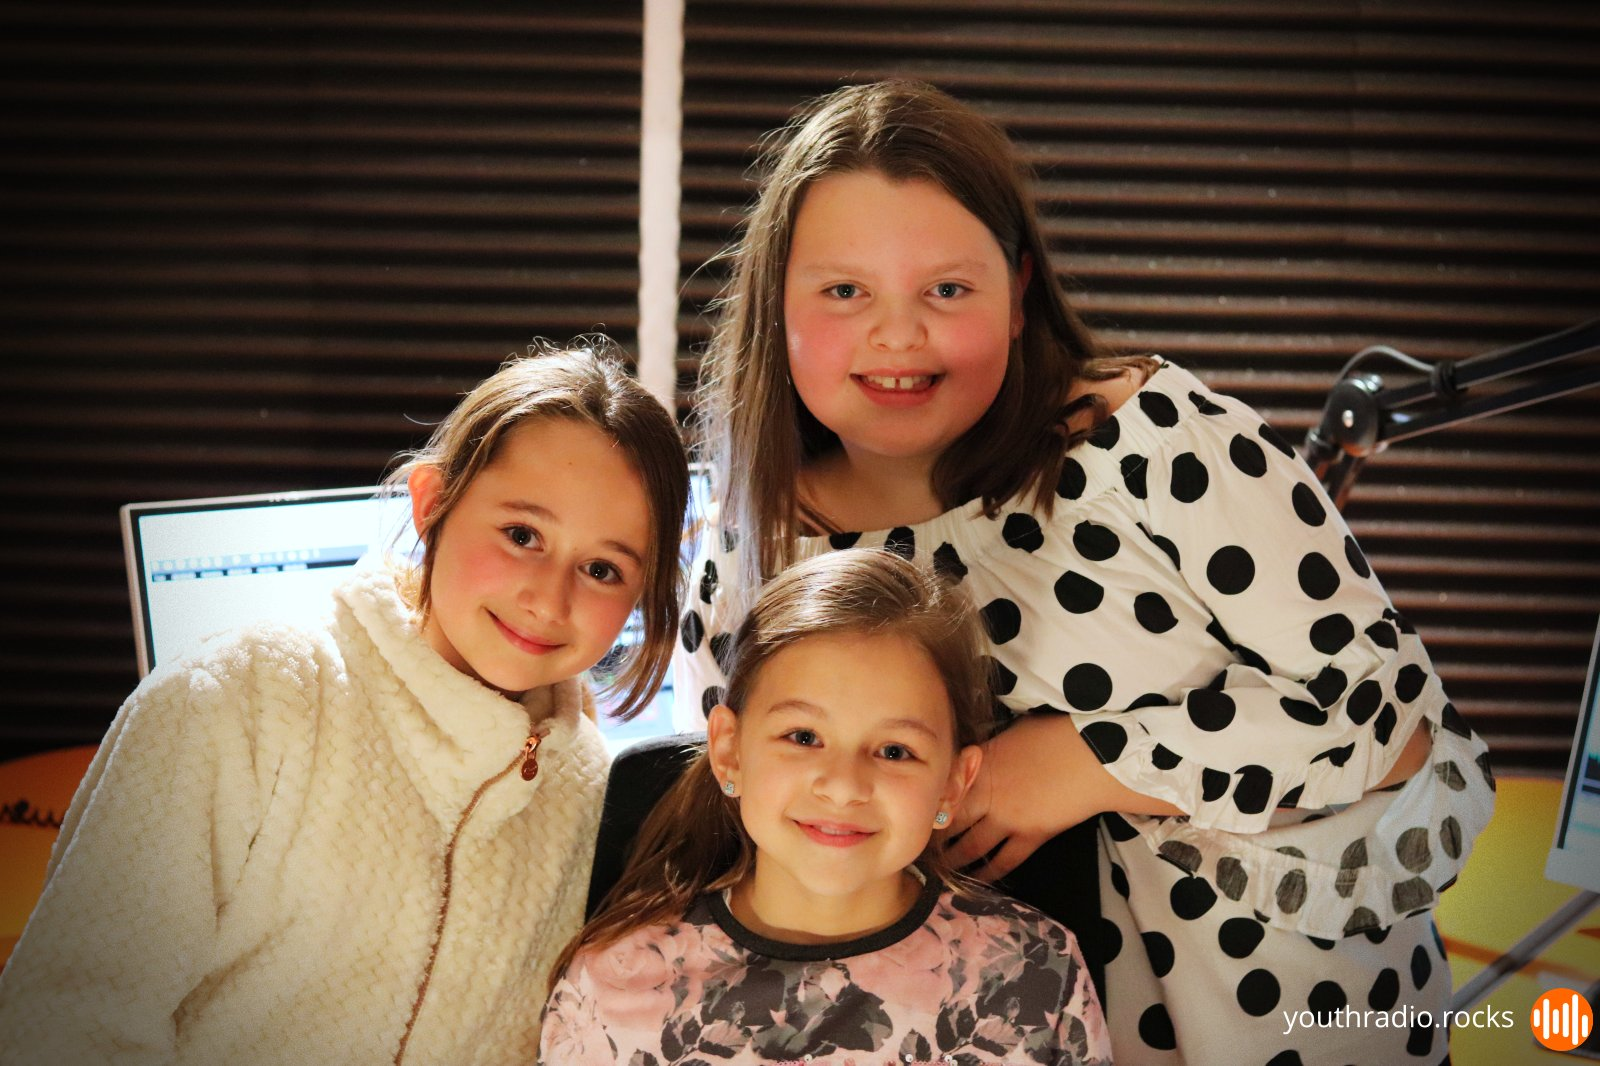 Youth Radio Rocks - Lola and Friends Radio Experience